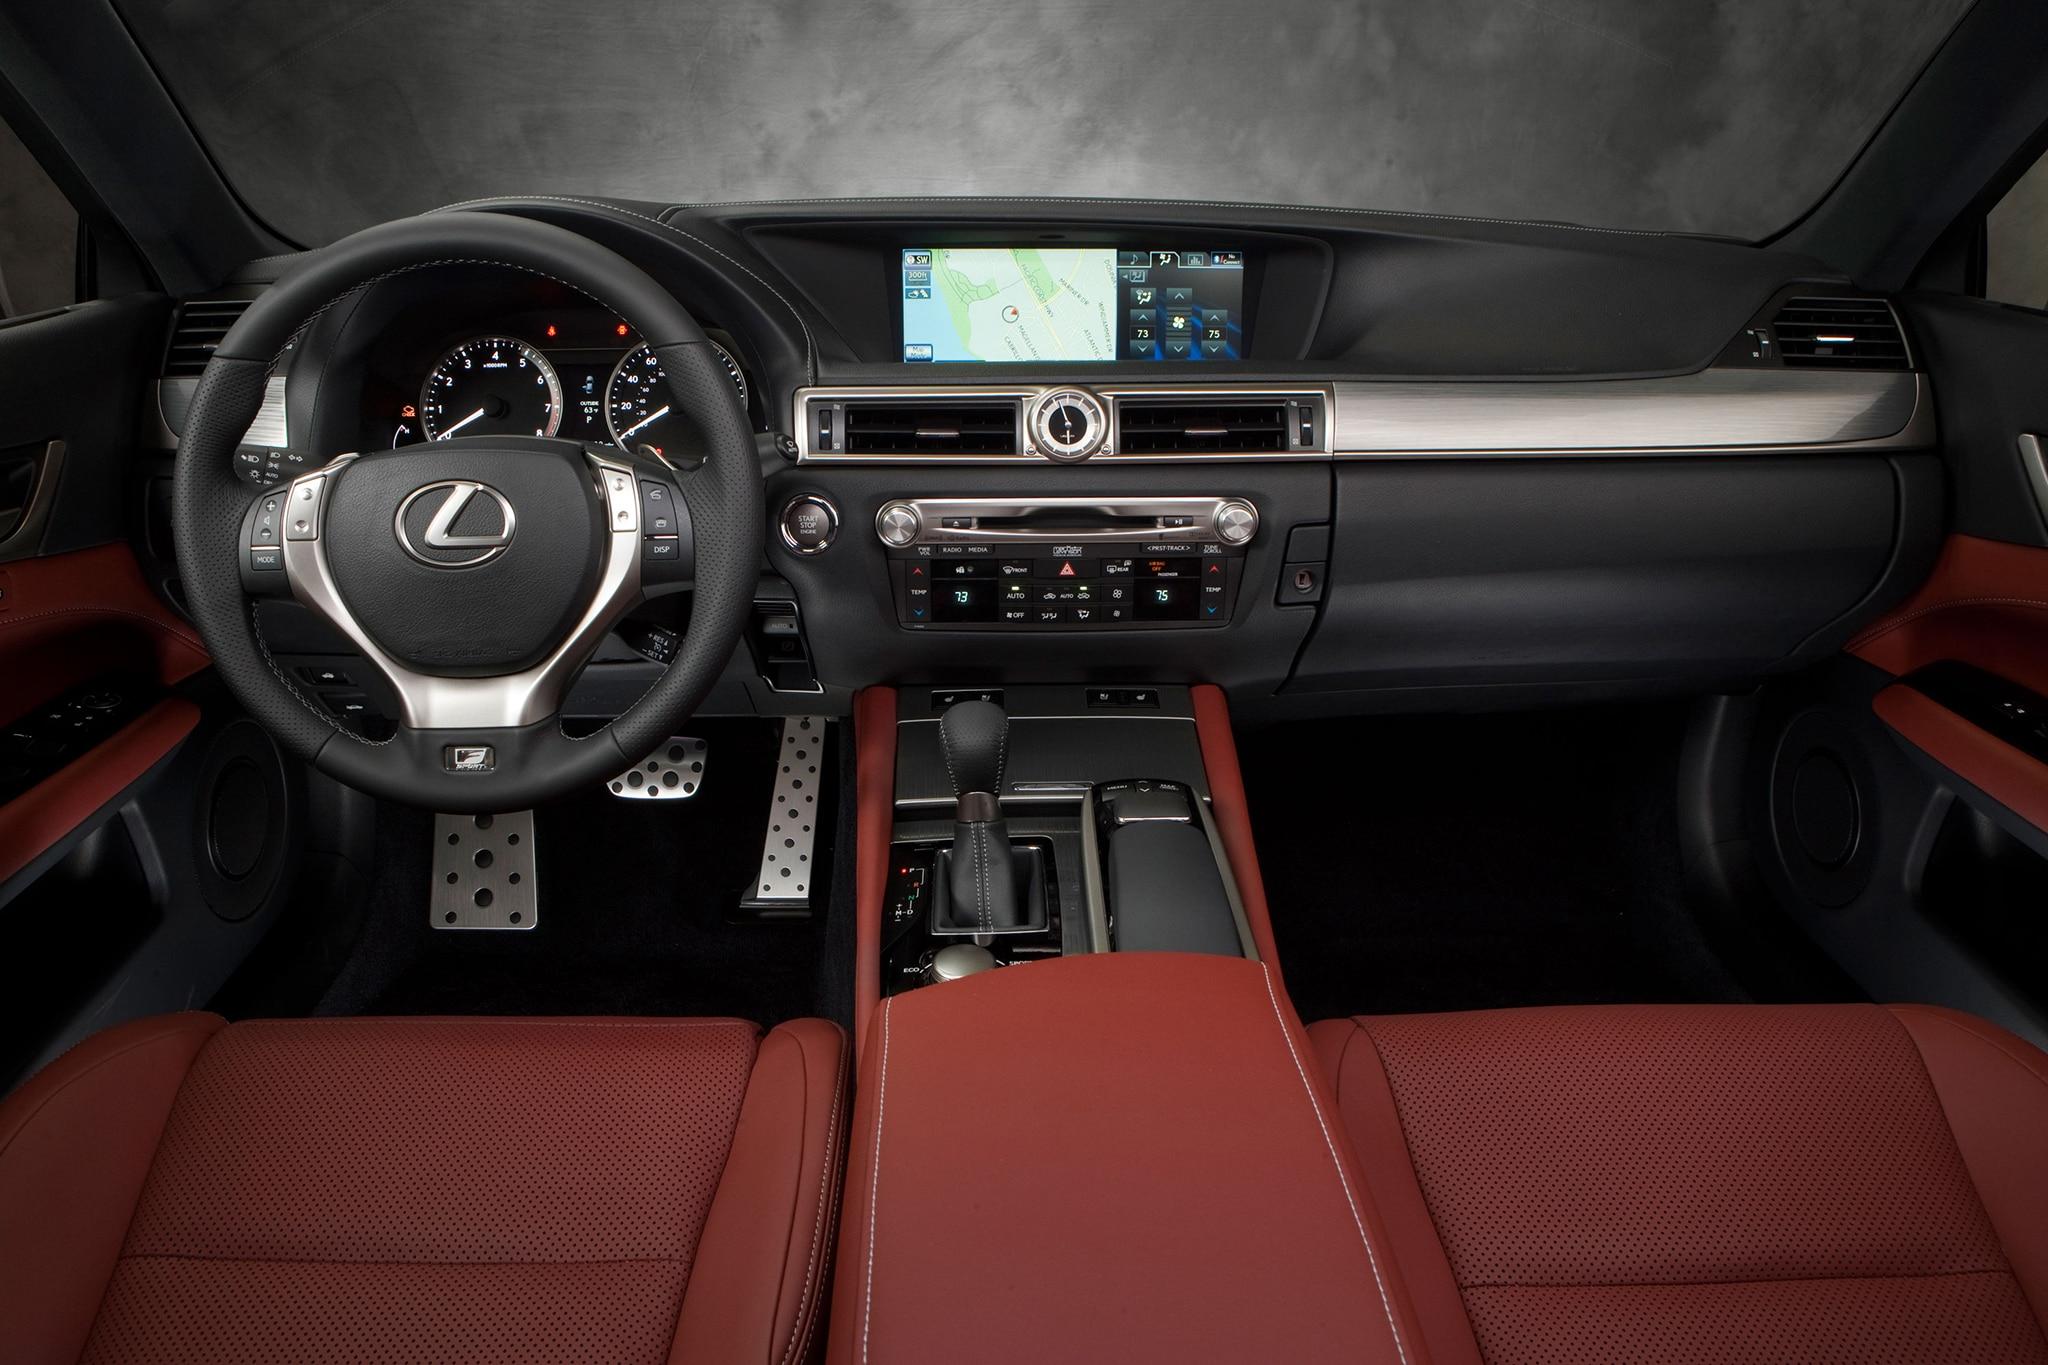 2017 lexus gs 350 f sport interior colors. Black Bedroom Furniture Sets. Home Design Ideas